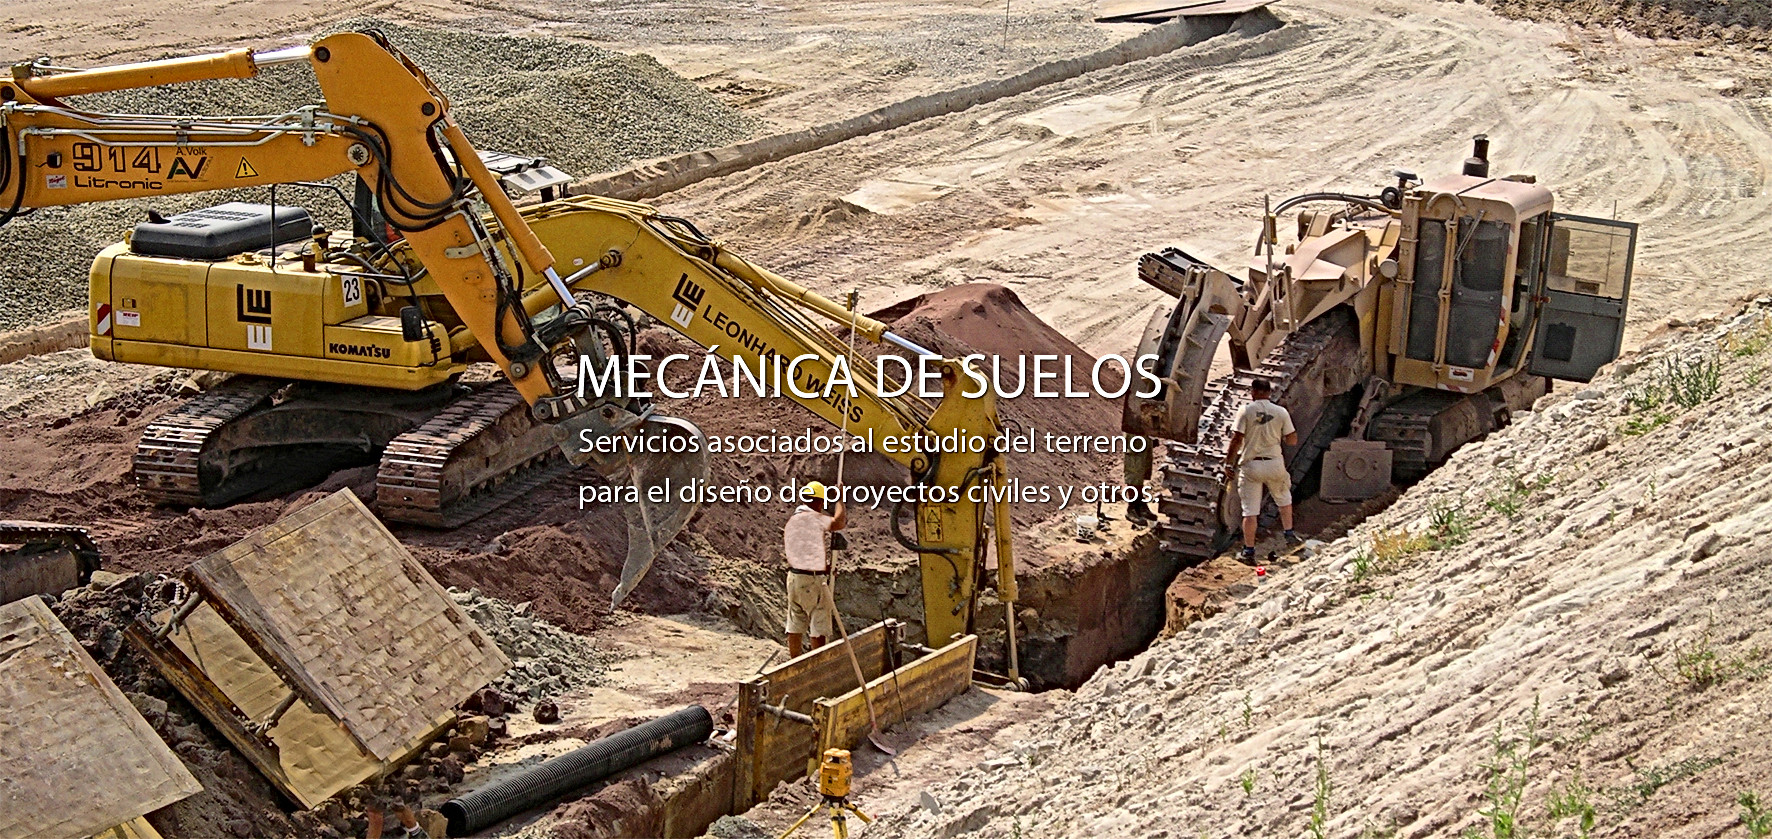 Mecánica de suelos